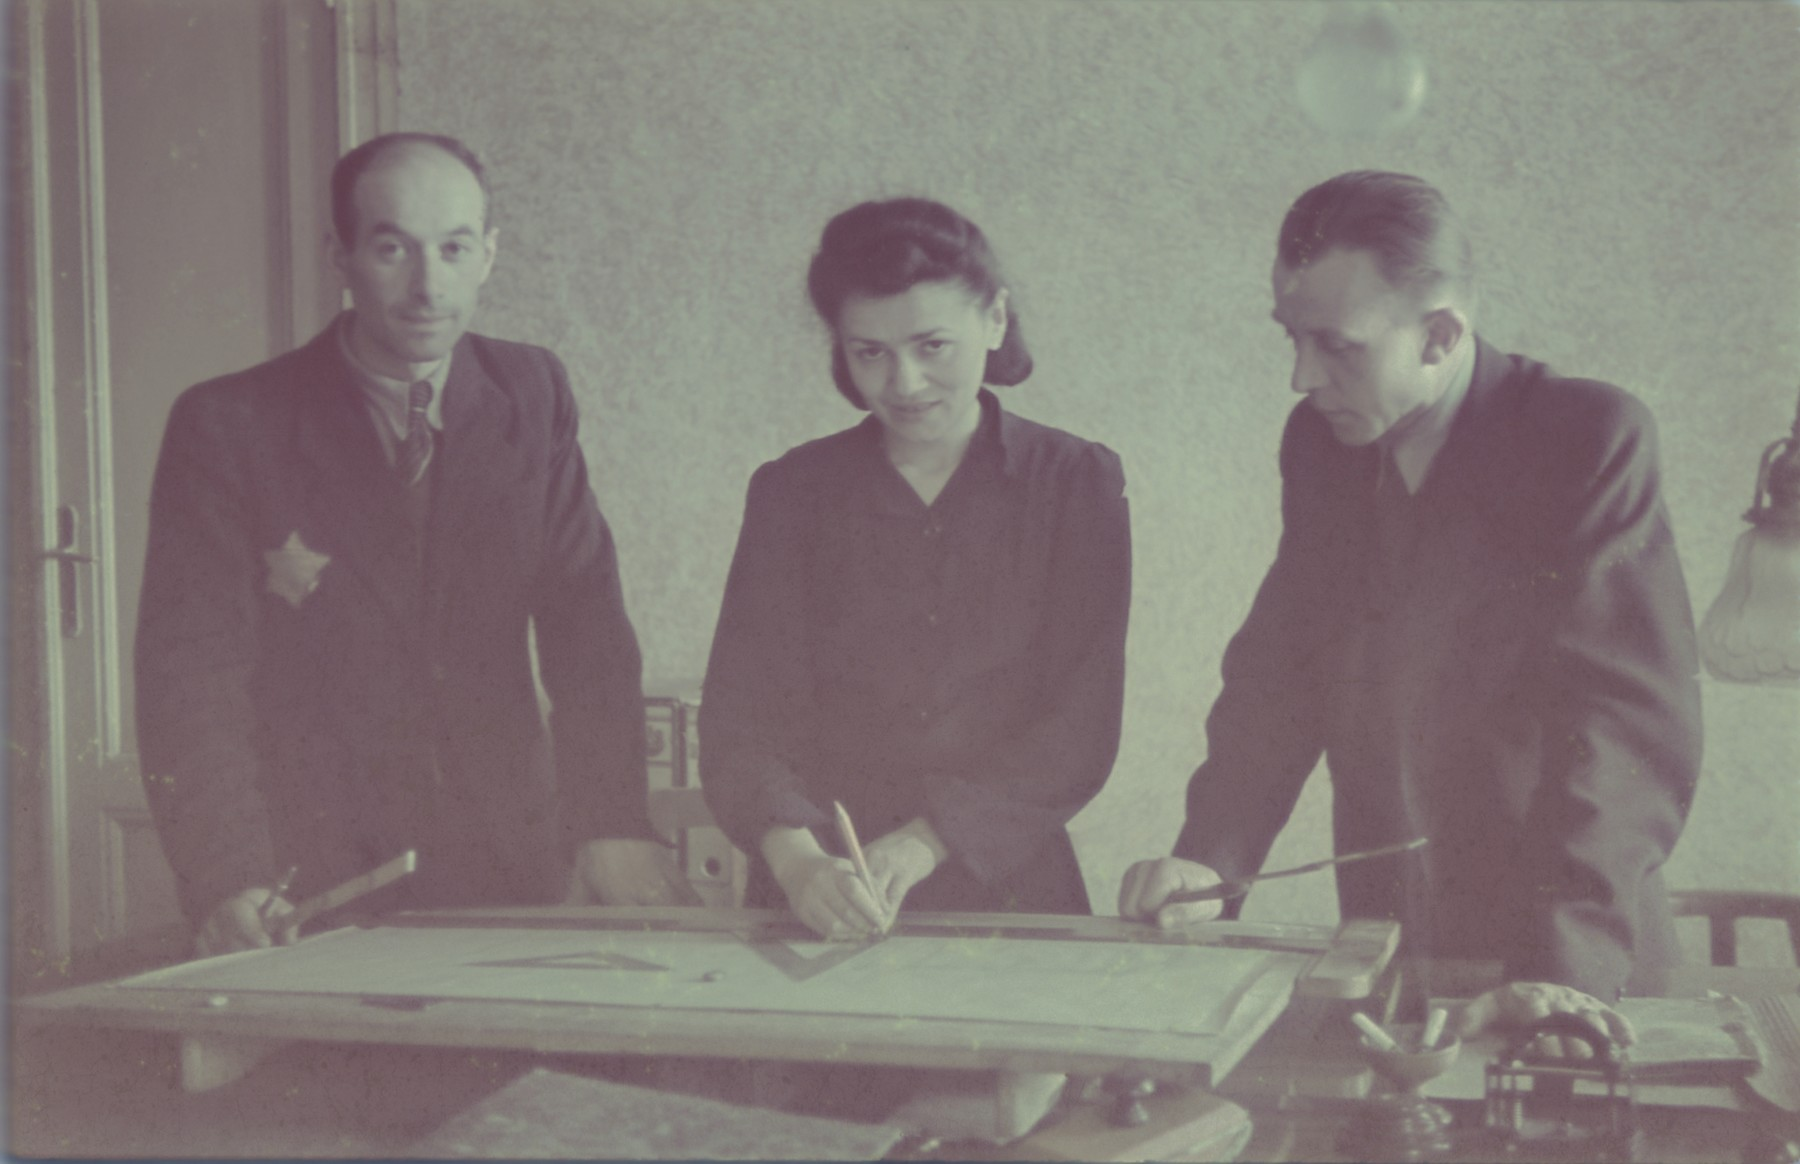 "Three designers look over plans in the office of the furniture factory.  Original German caption: ""Geto-Litzmannstadt, Architekten der Moebelfabrik""  (designers in the furniture factory), #209.  (Previous number 163 is crossed out.)"